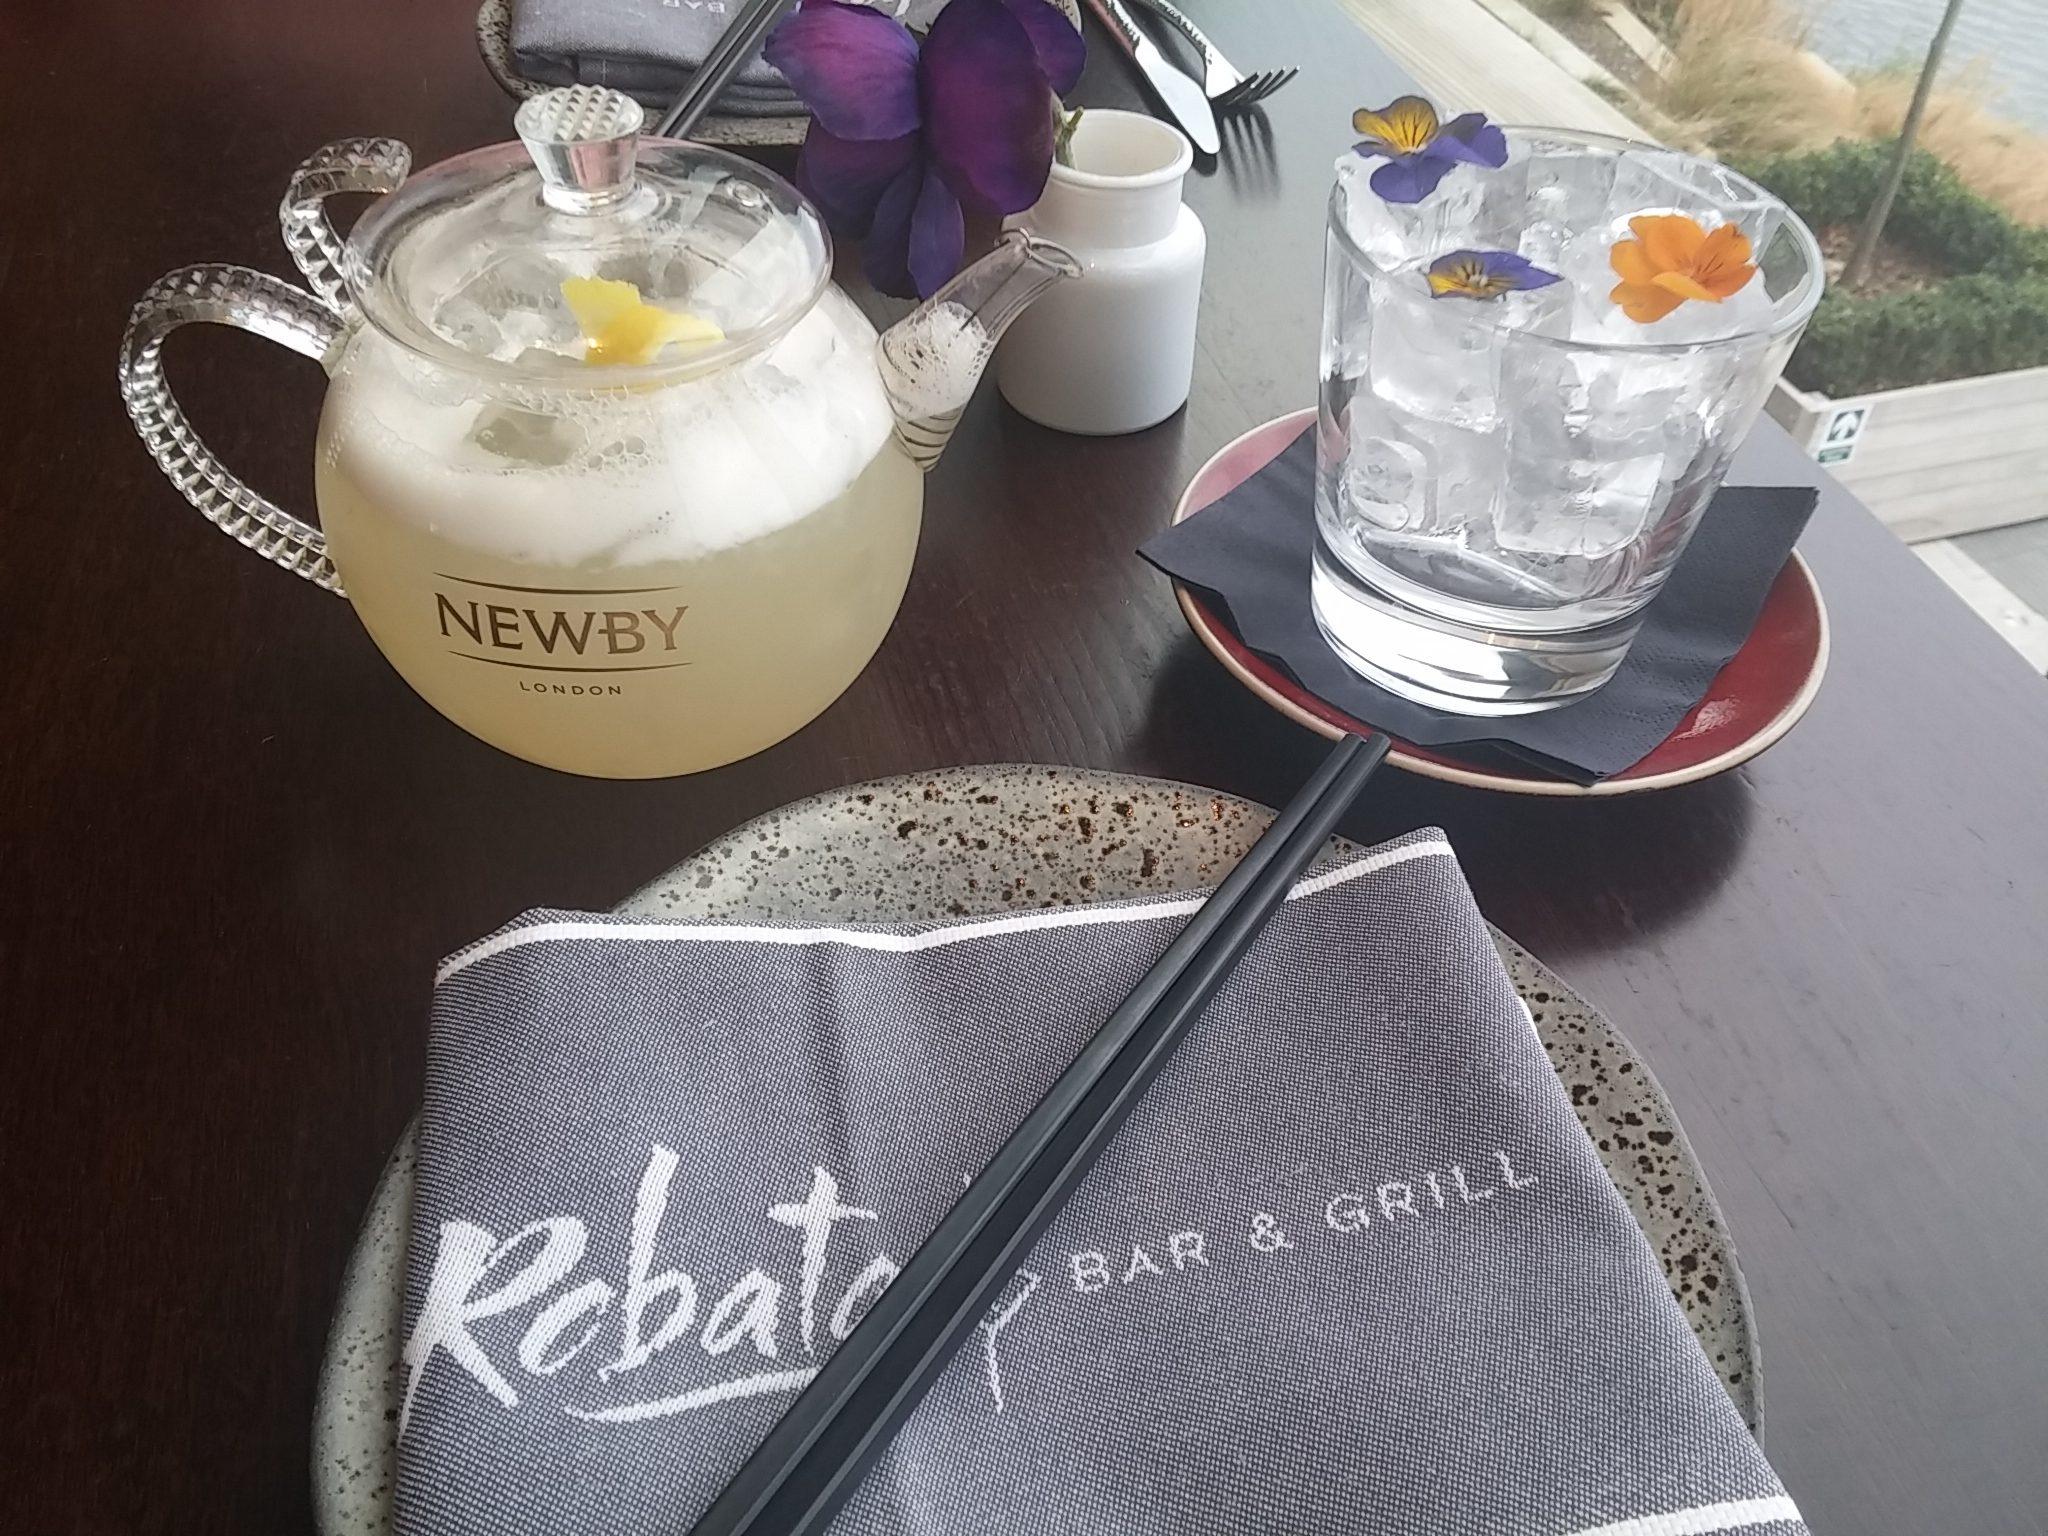 Restaurant review: Robata Bar & Grill, Resorts World, Birmingham